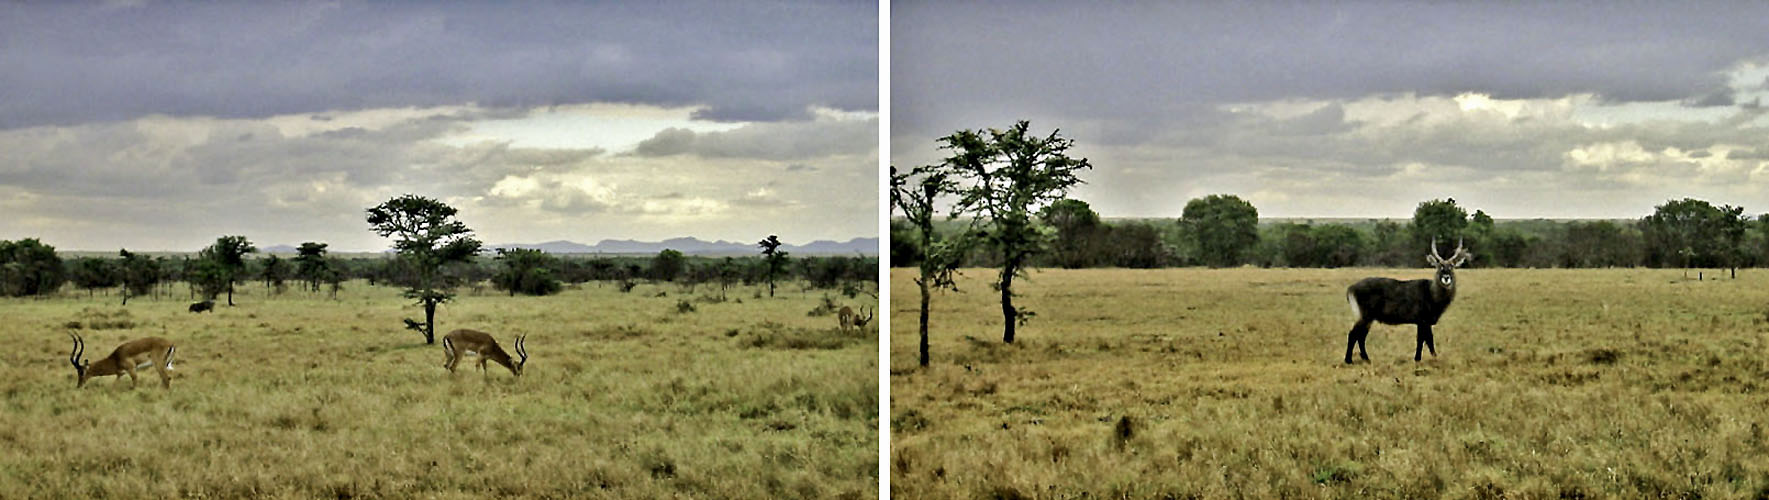 Africa Kenya Ol Pejeta Conservancy Impala Waterbuck